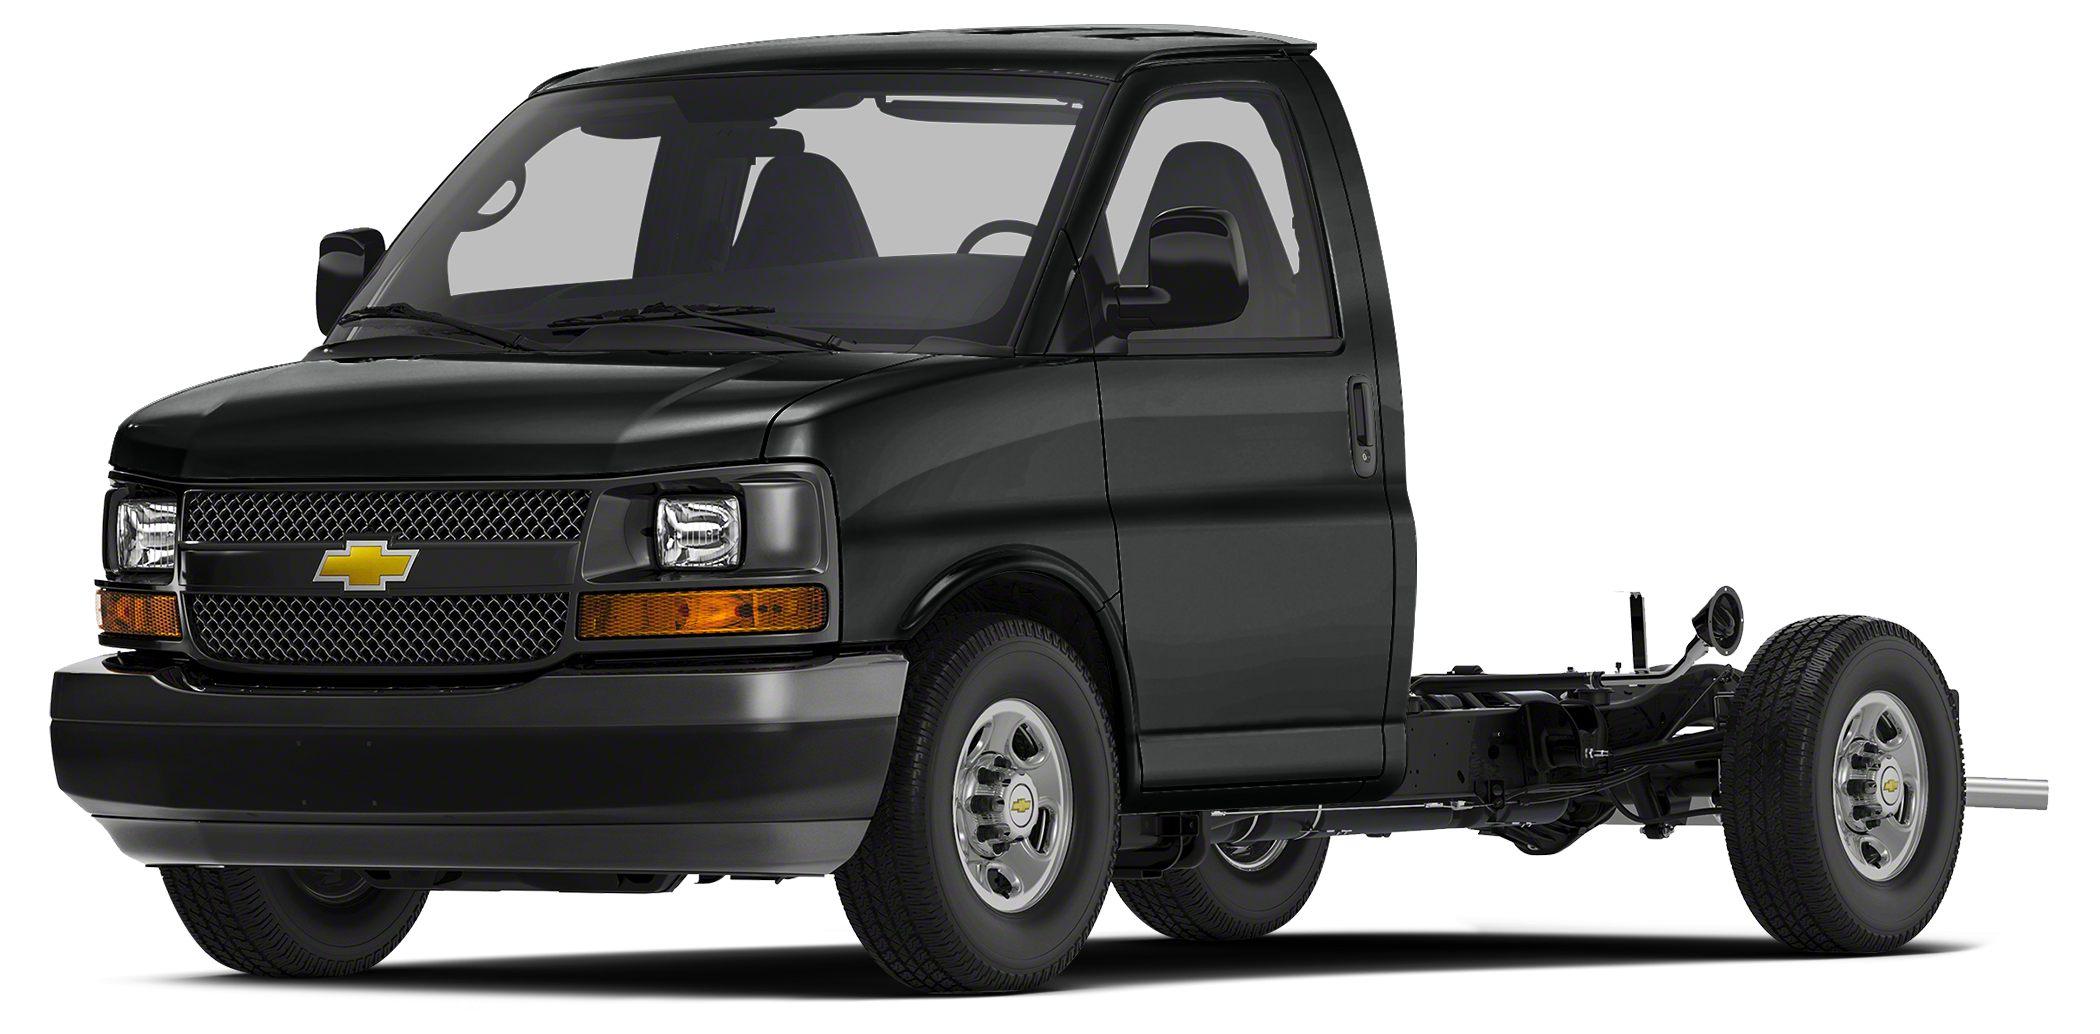 2020 Ram Express Cutaway Work Van